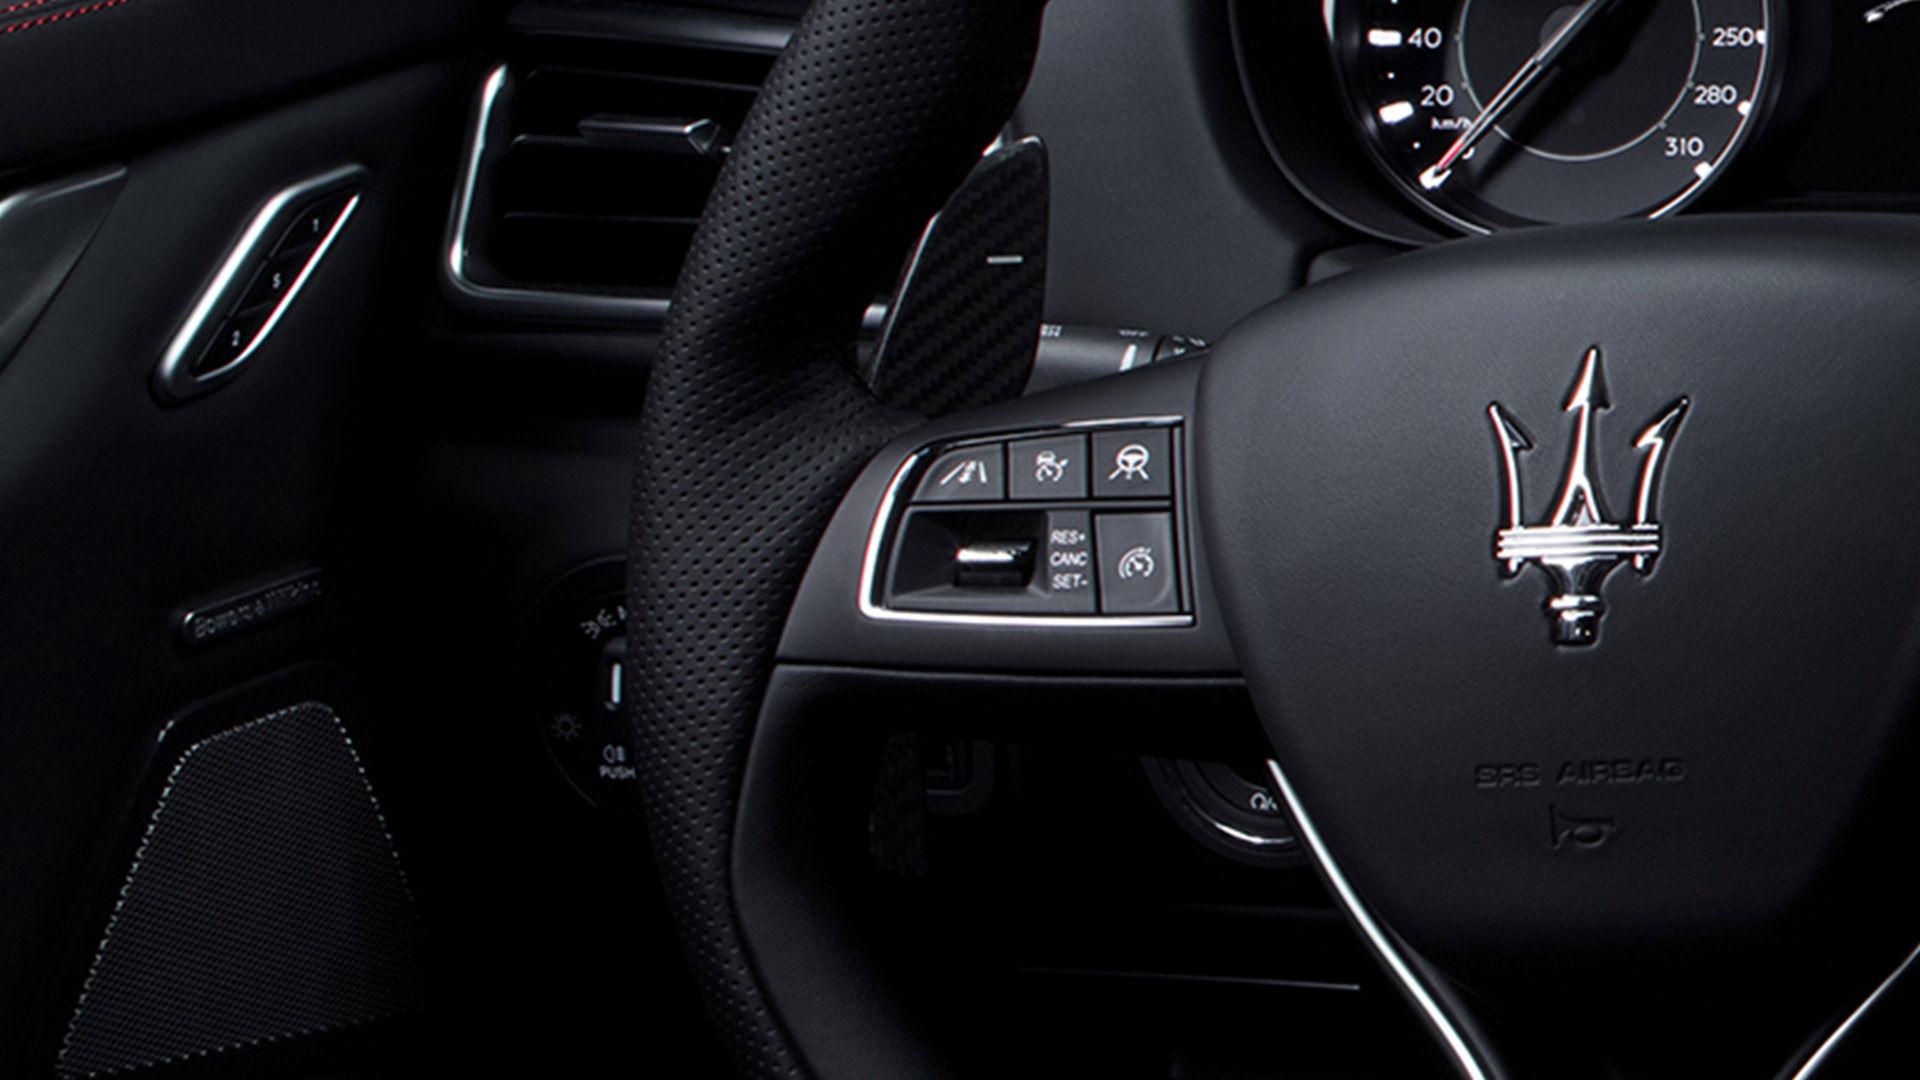 Maserati Ghibli - Assistenzsysteme - Detailansicht des Lenkrads